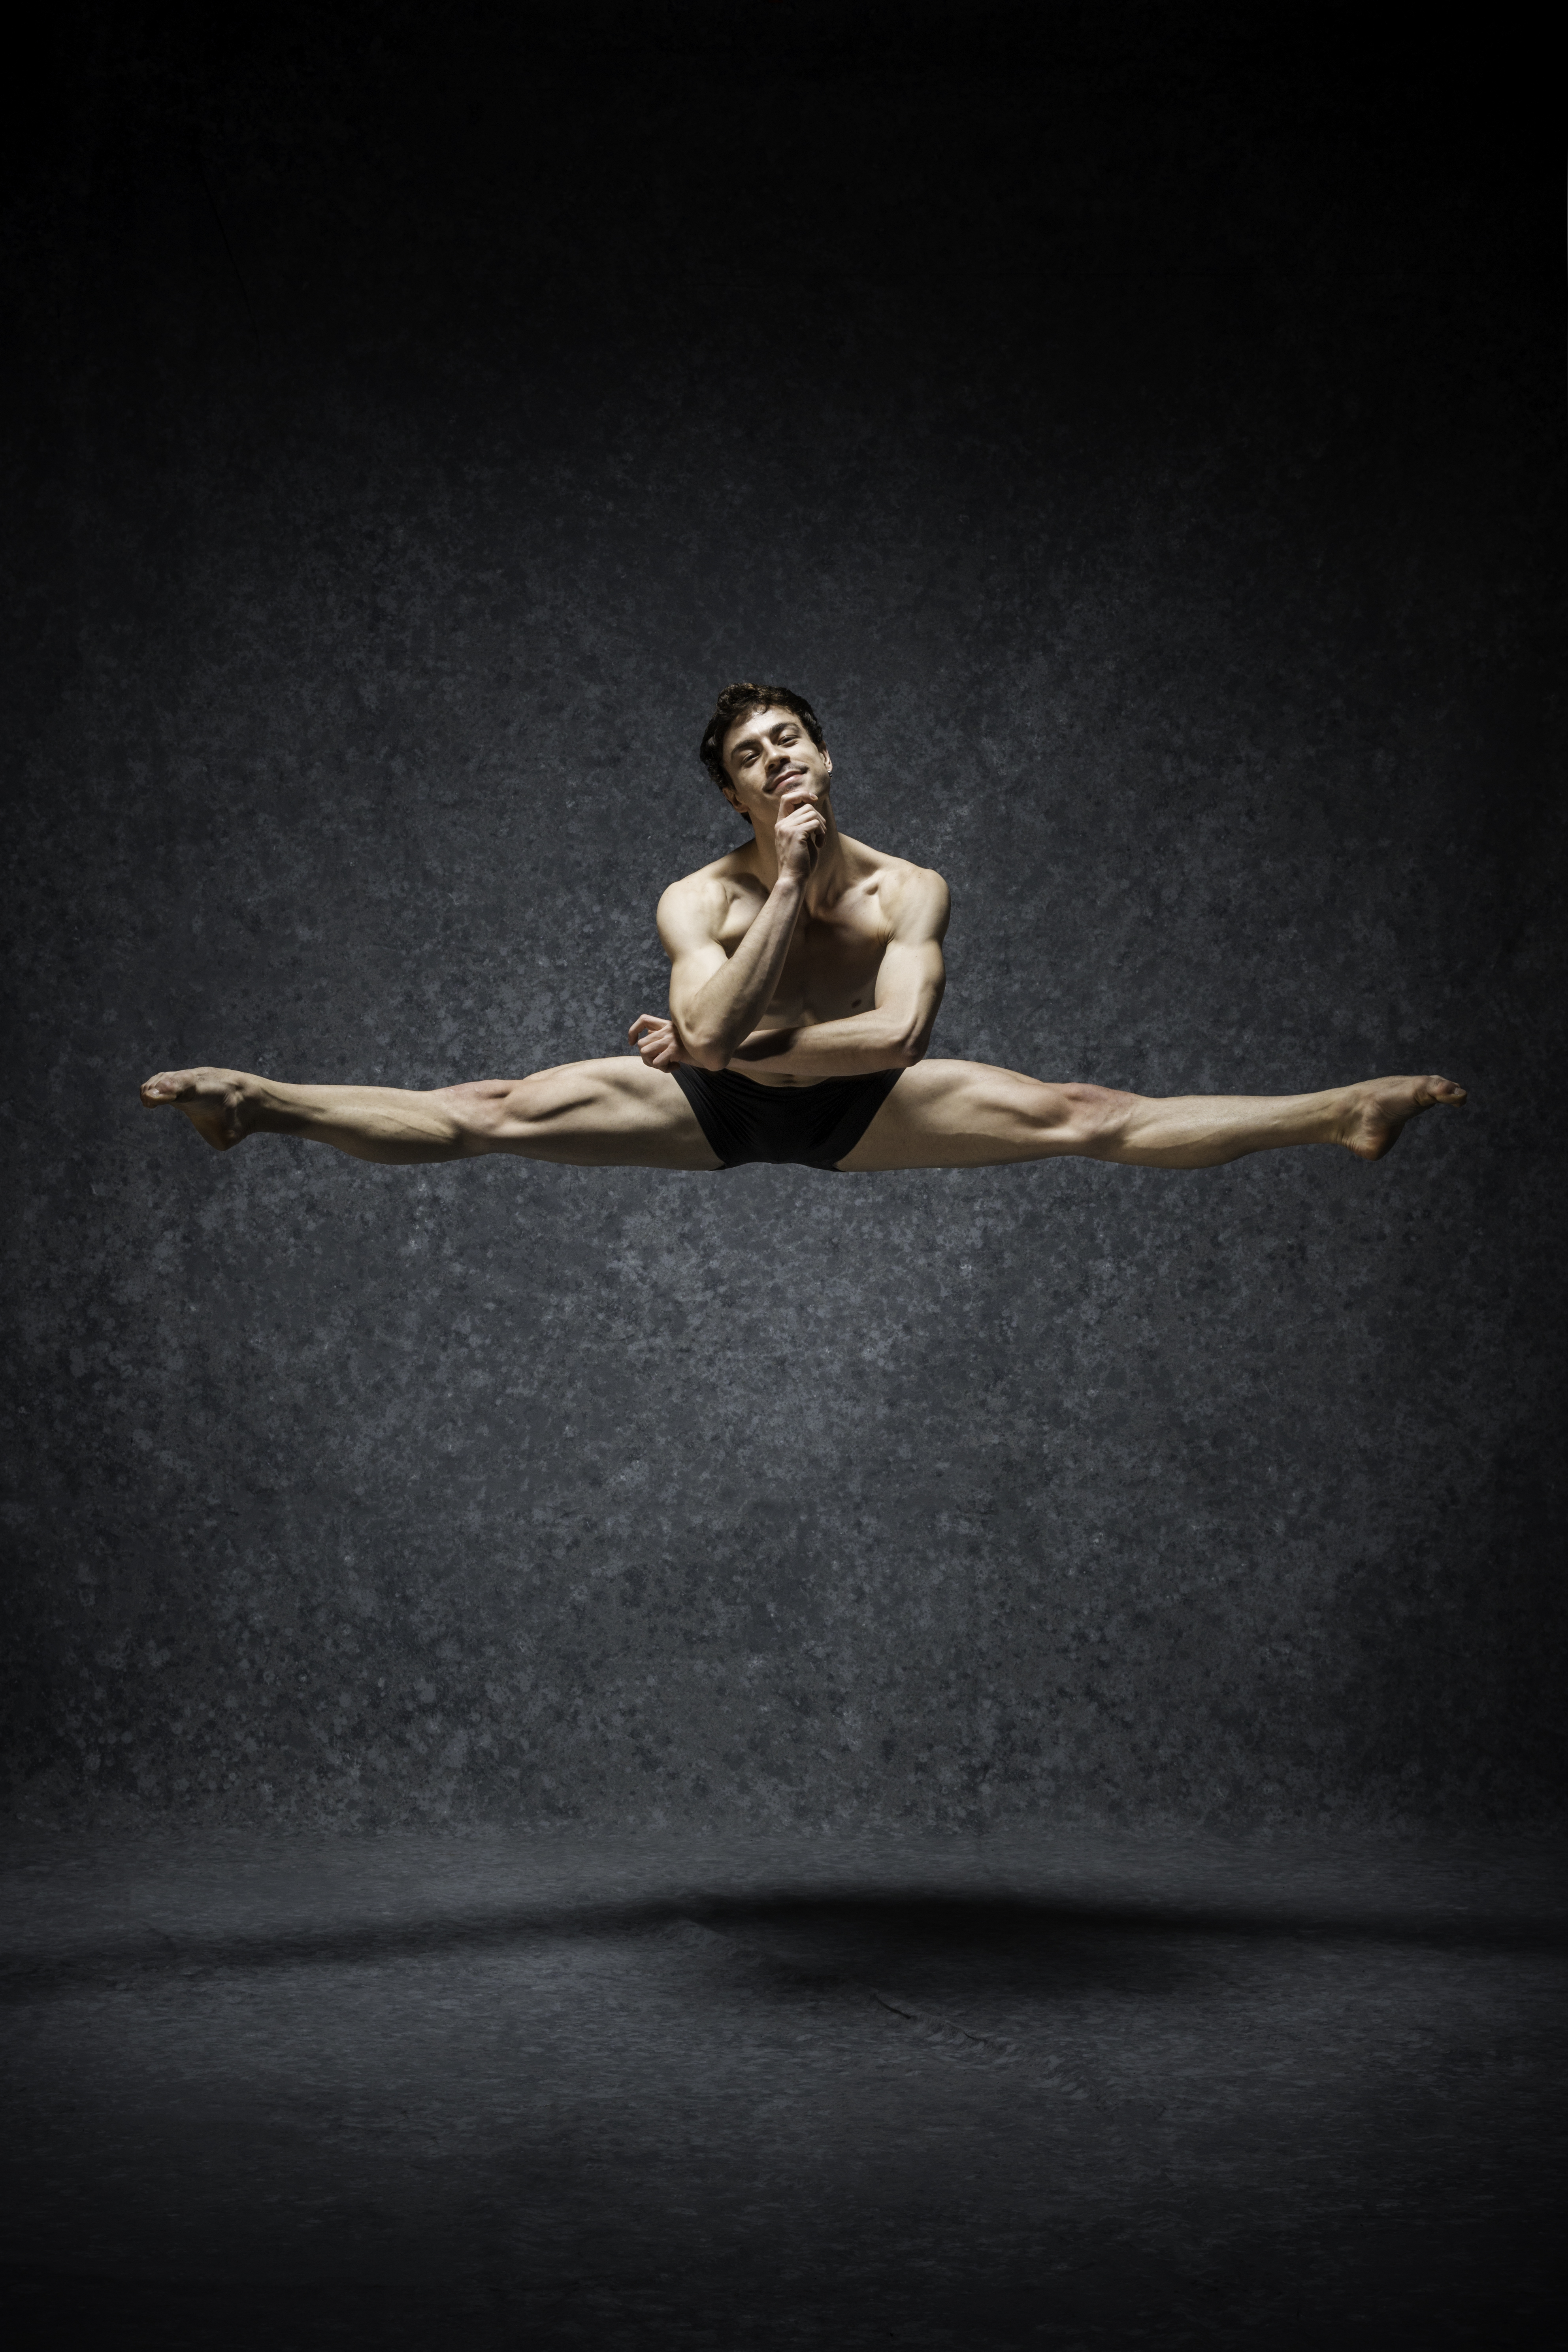 Giulio Panzi